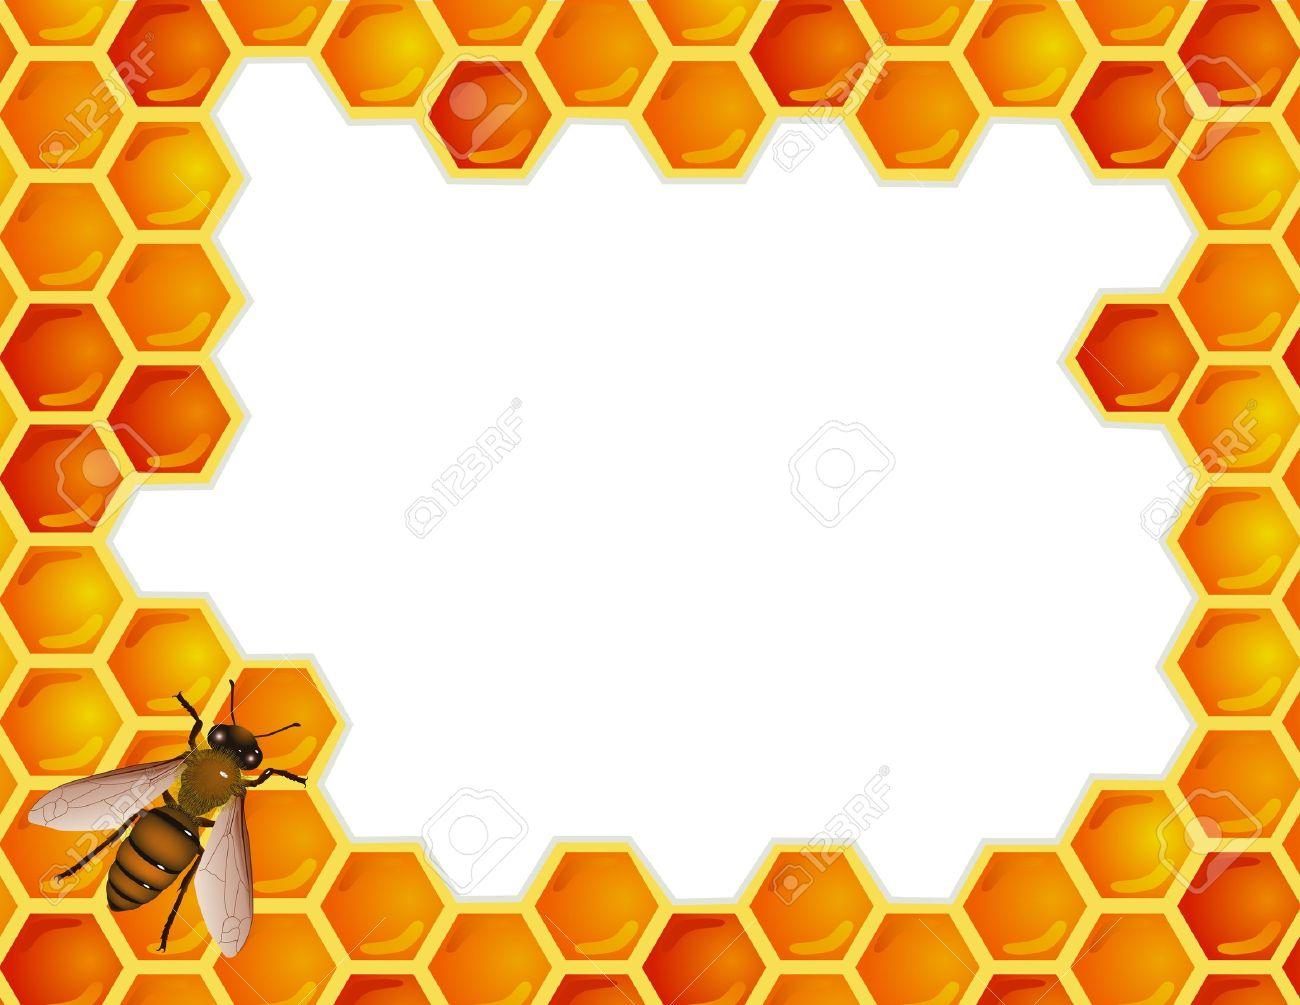 Bee with honey comb Stock Vector - 12152547